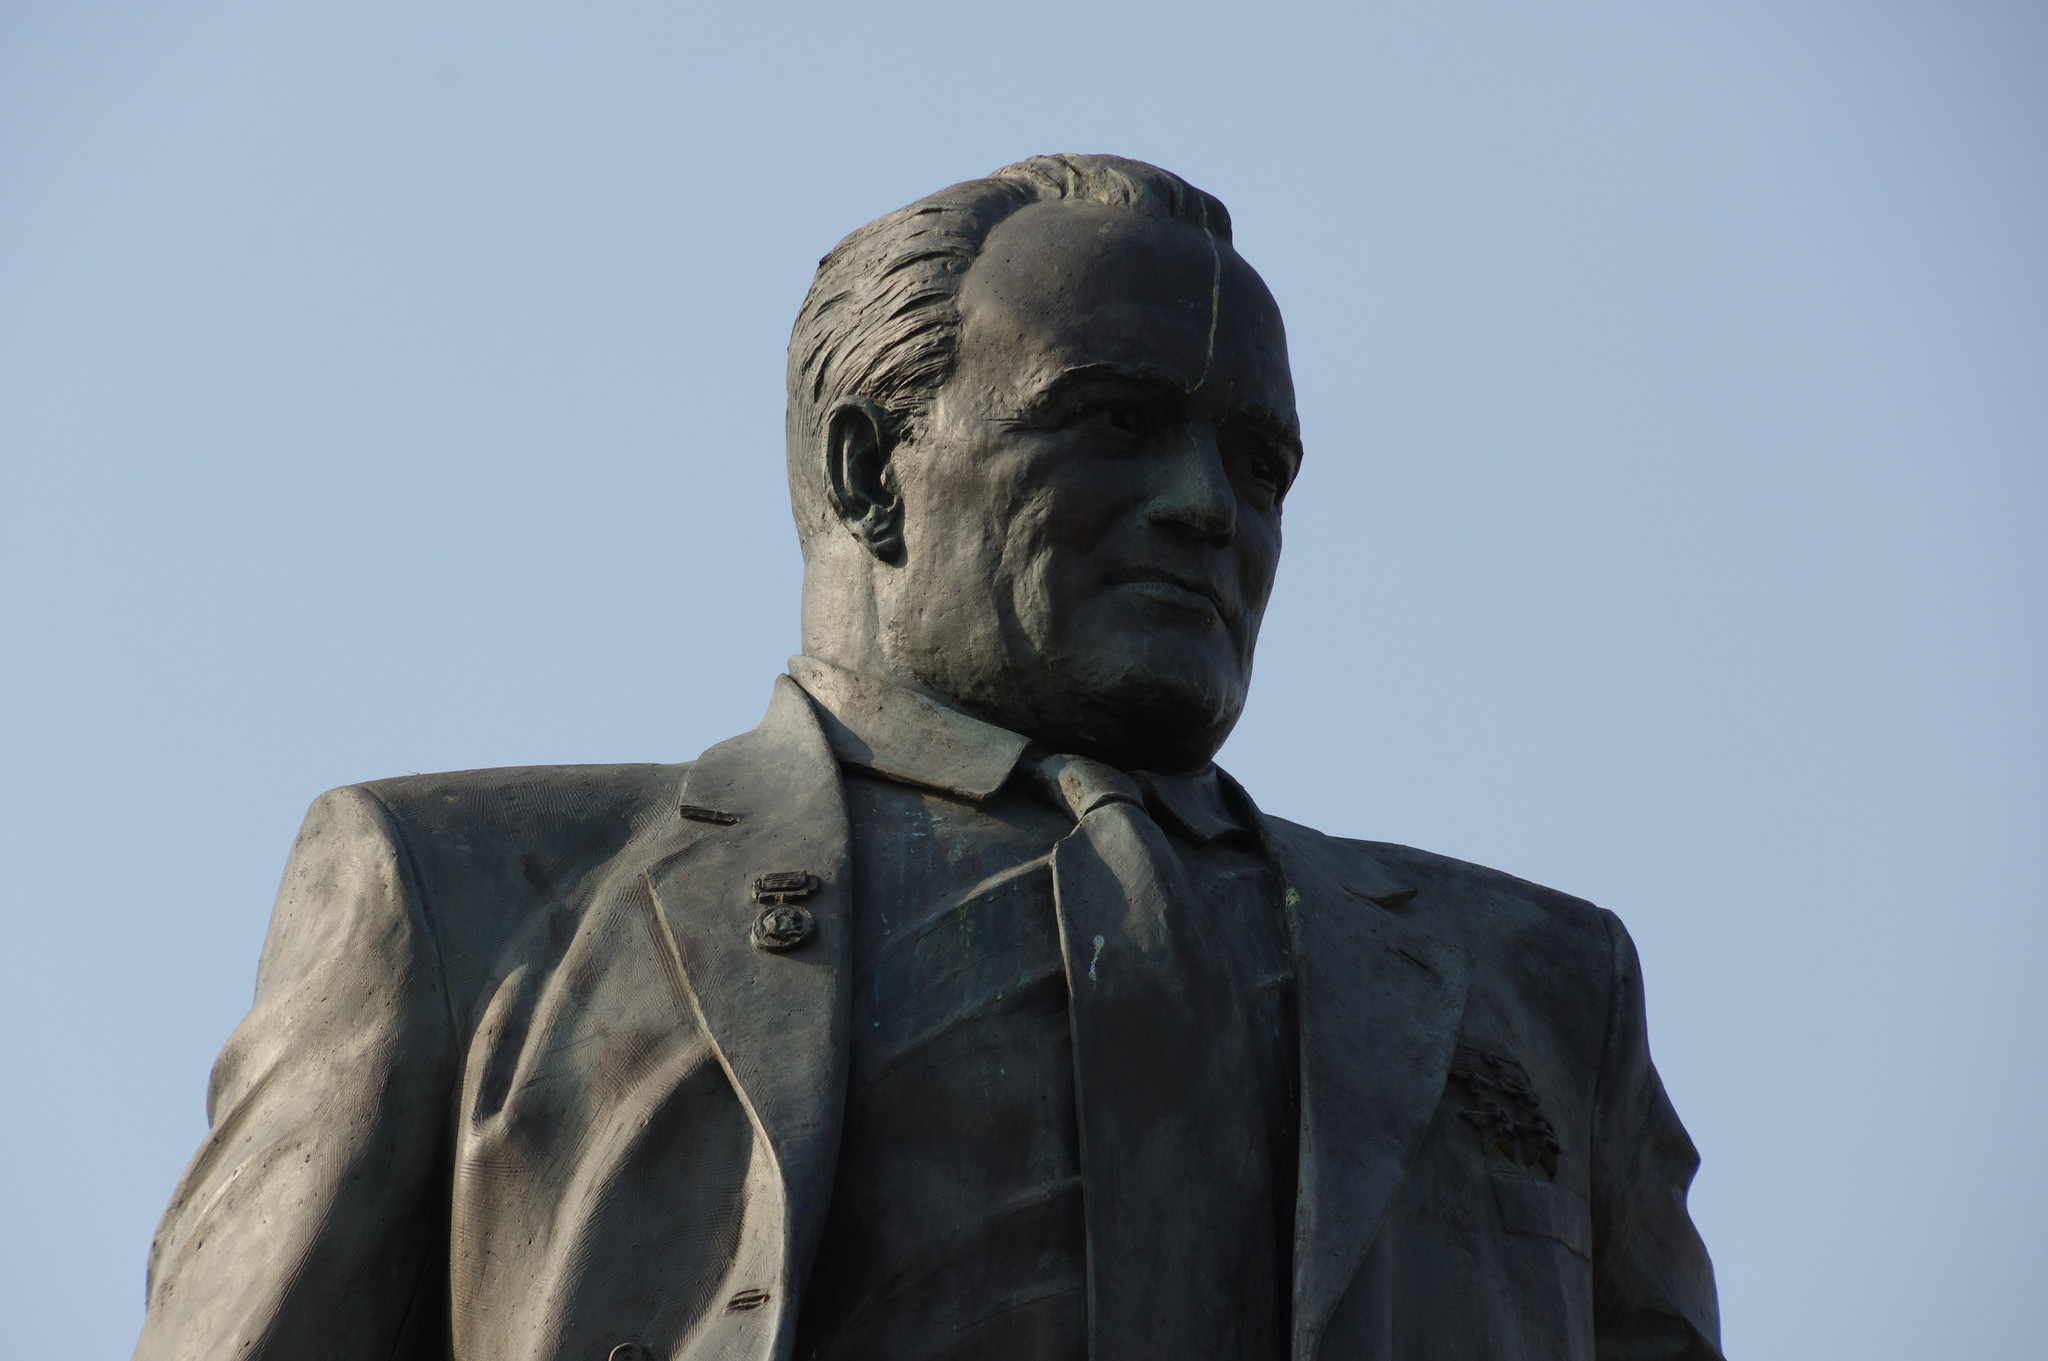 Памятник Сергею Павловичу Королёву